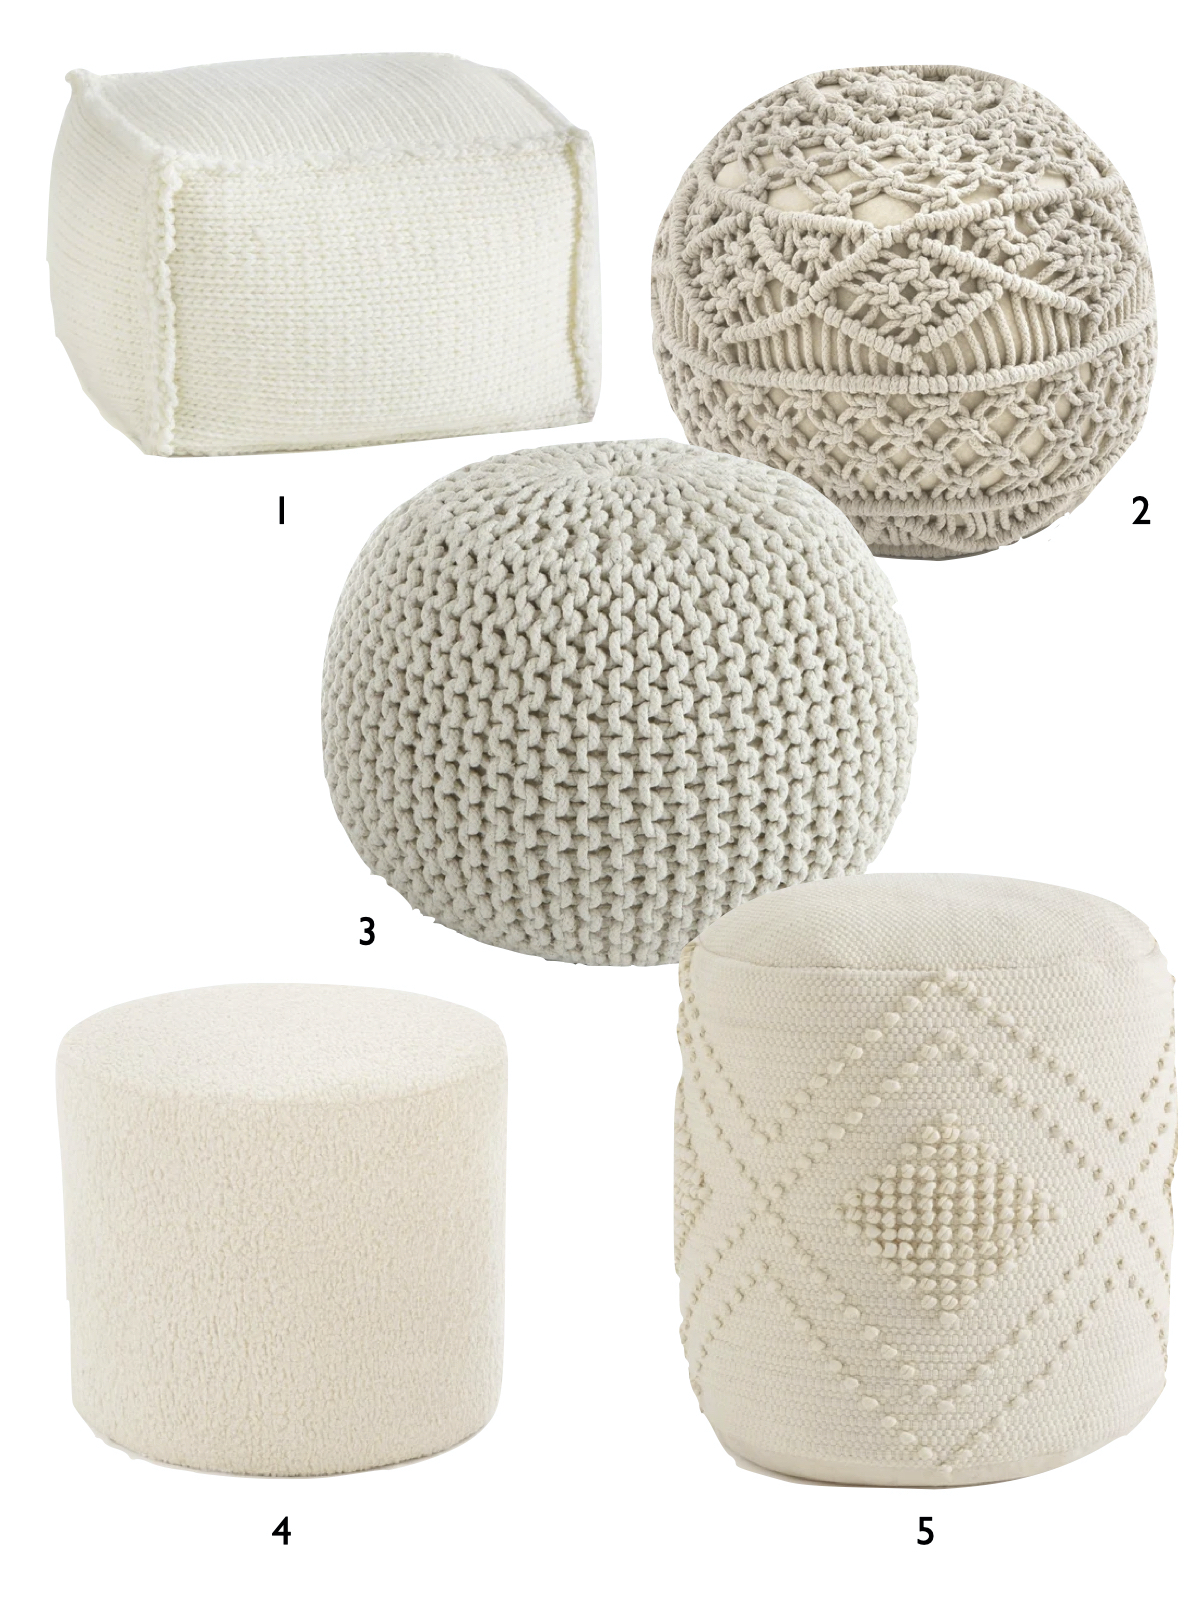 pouf tricot hiver cocooning blanc beige tendance design - blog déco - clemaroundthecorner